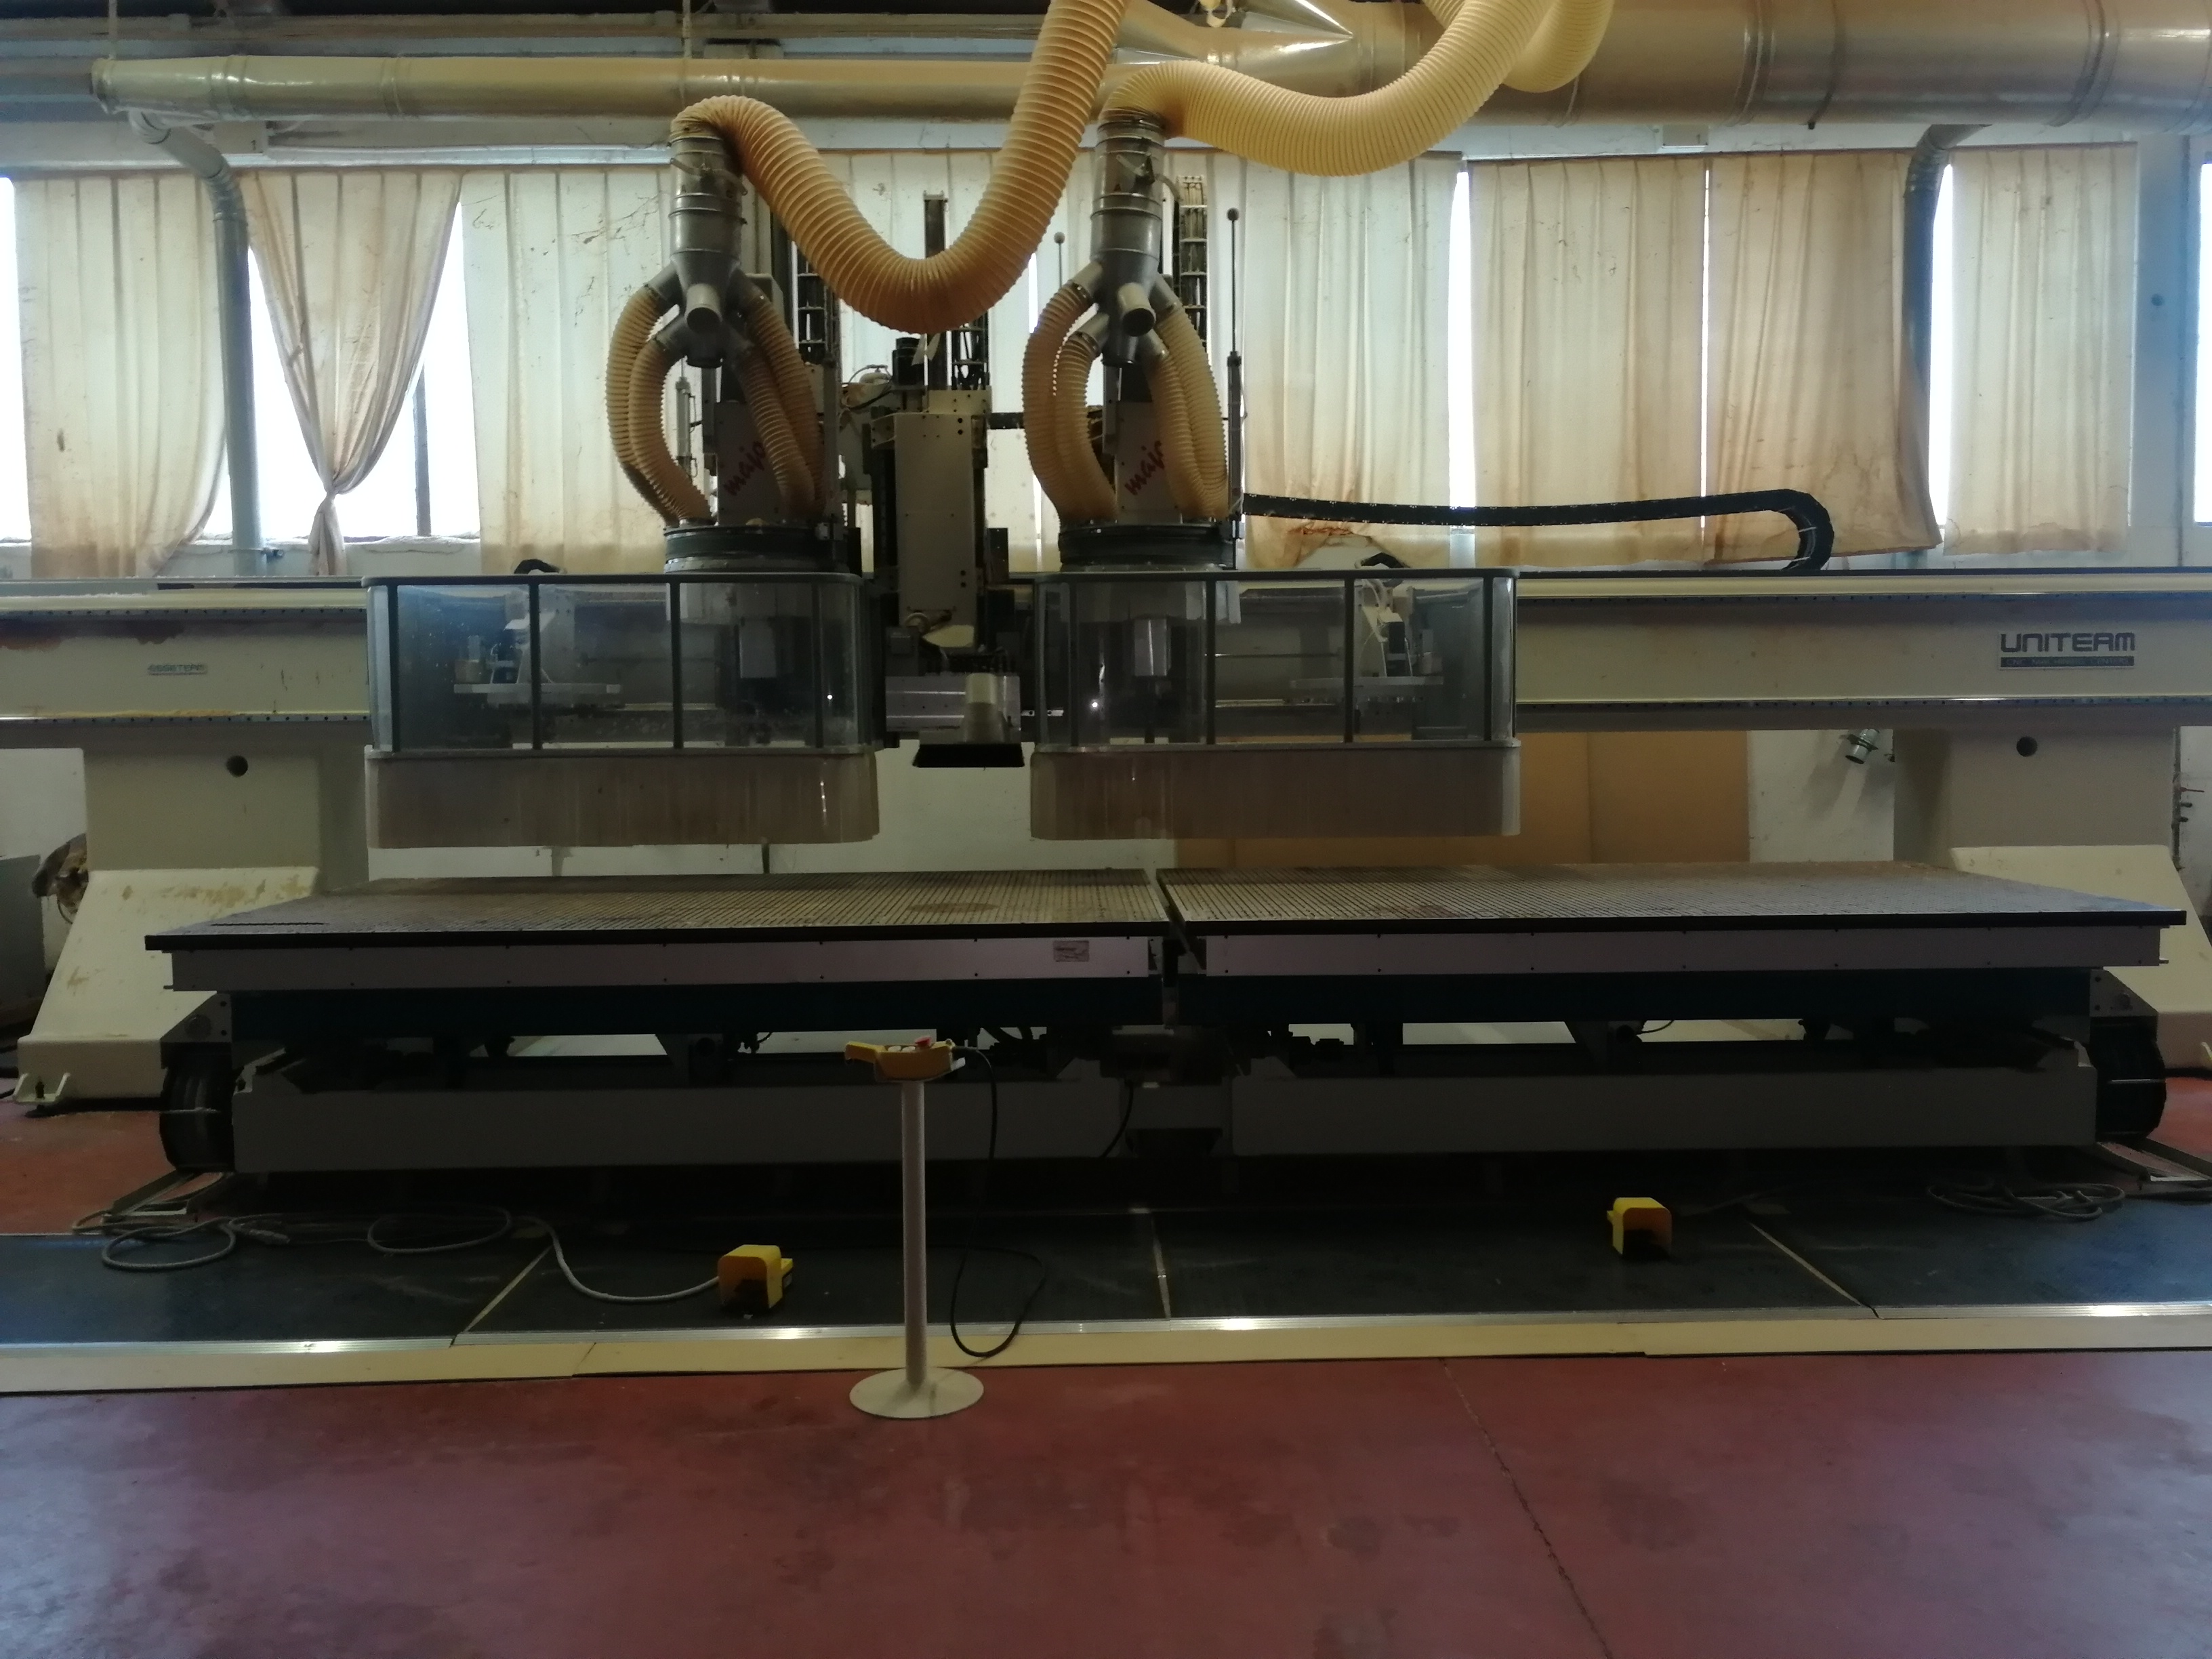 CNC DOPPIA TESTA 5 ASSI - UNITEAM MAJOR 2R/6016-430 in vendita - foto 3